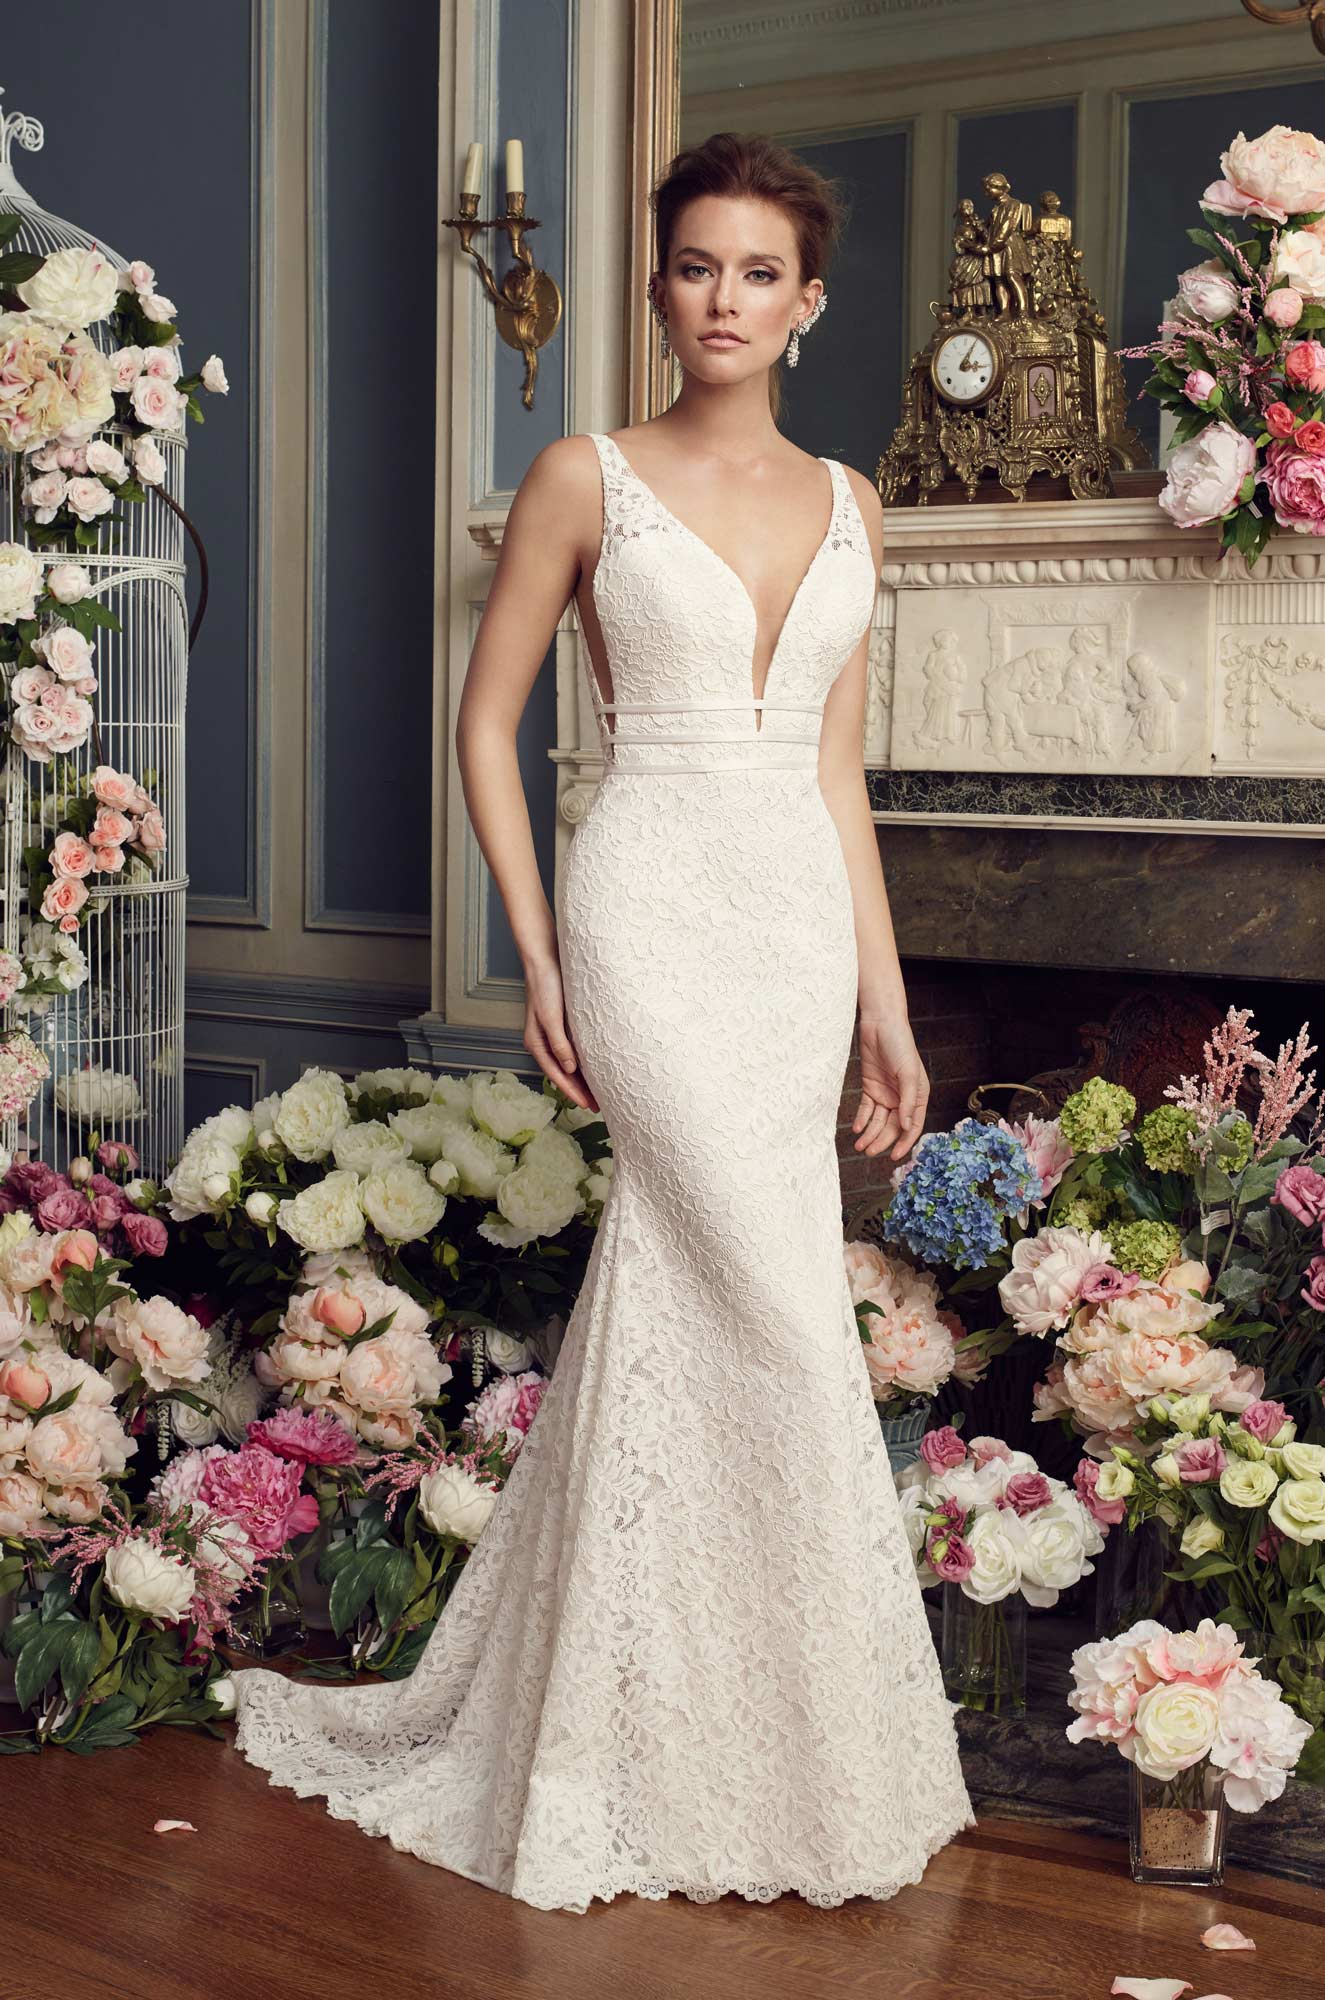 Dramatic Lace Wedding Dress - Style #2154 | Mikaella Bridal